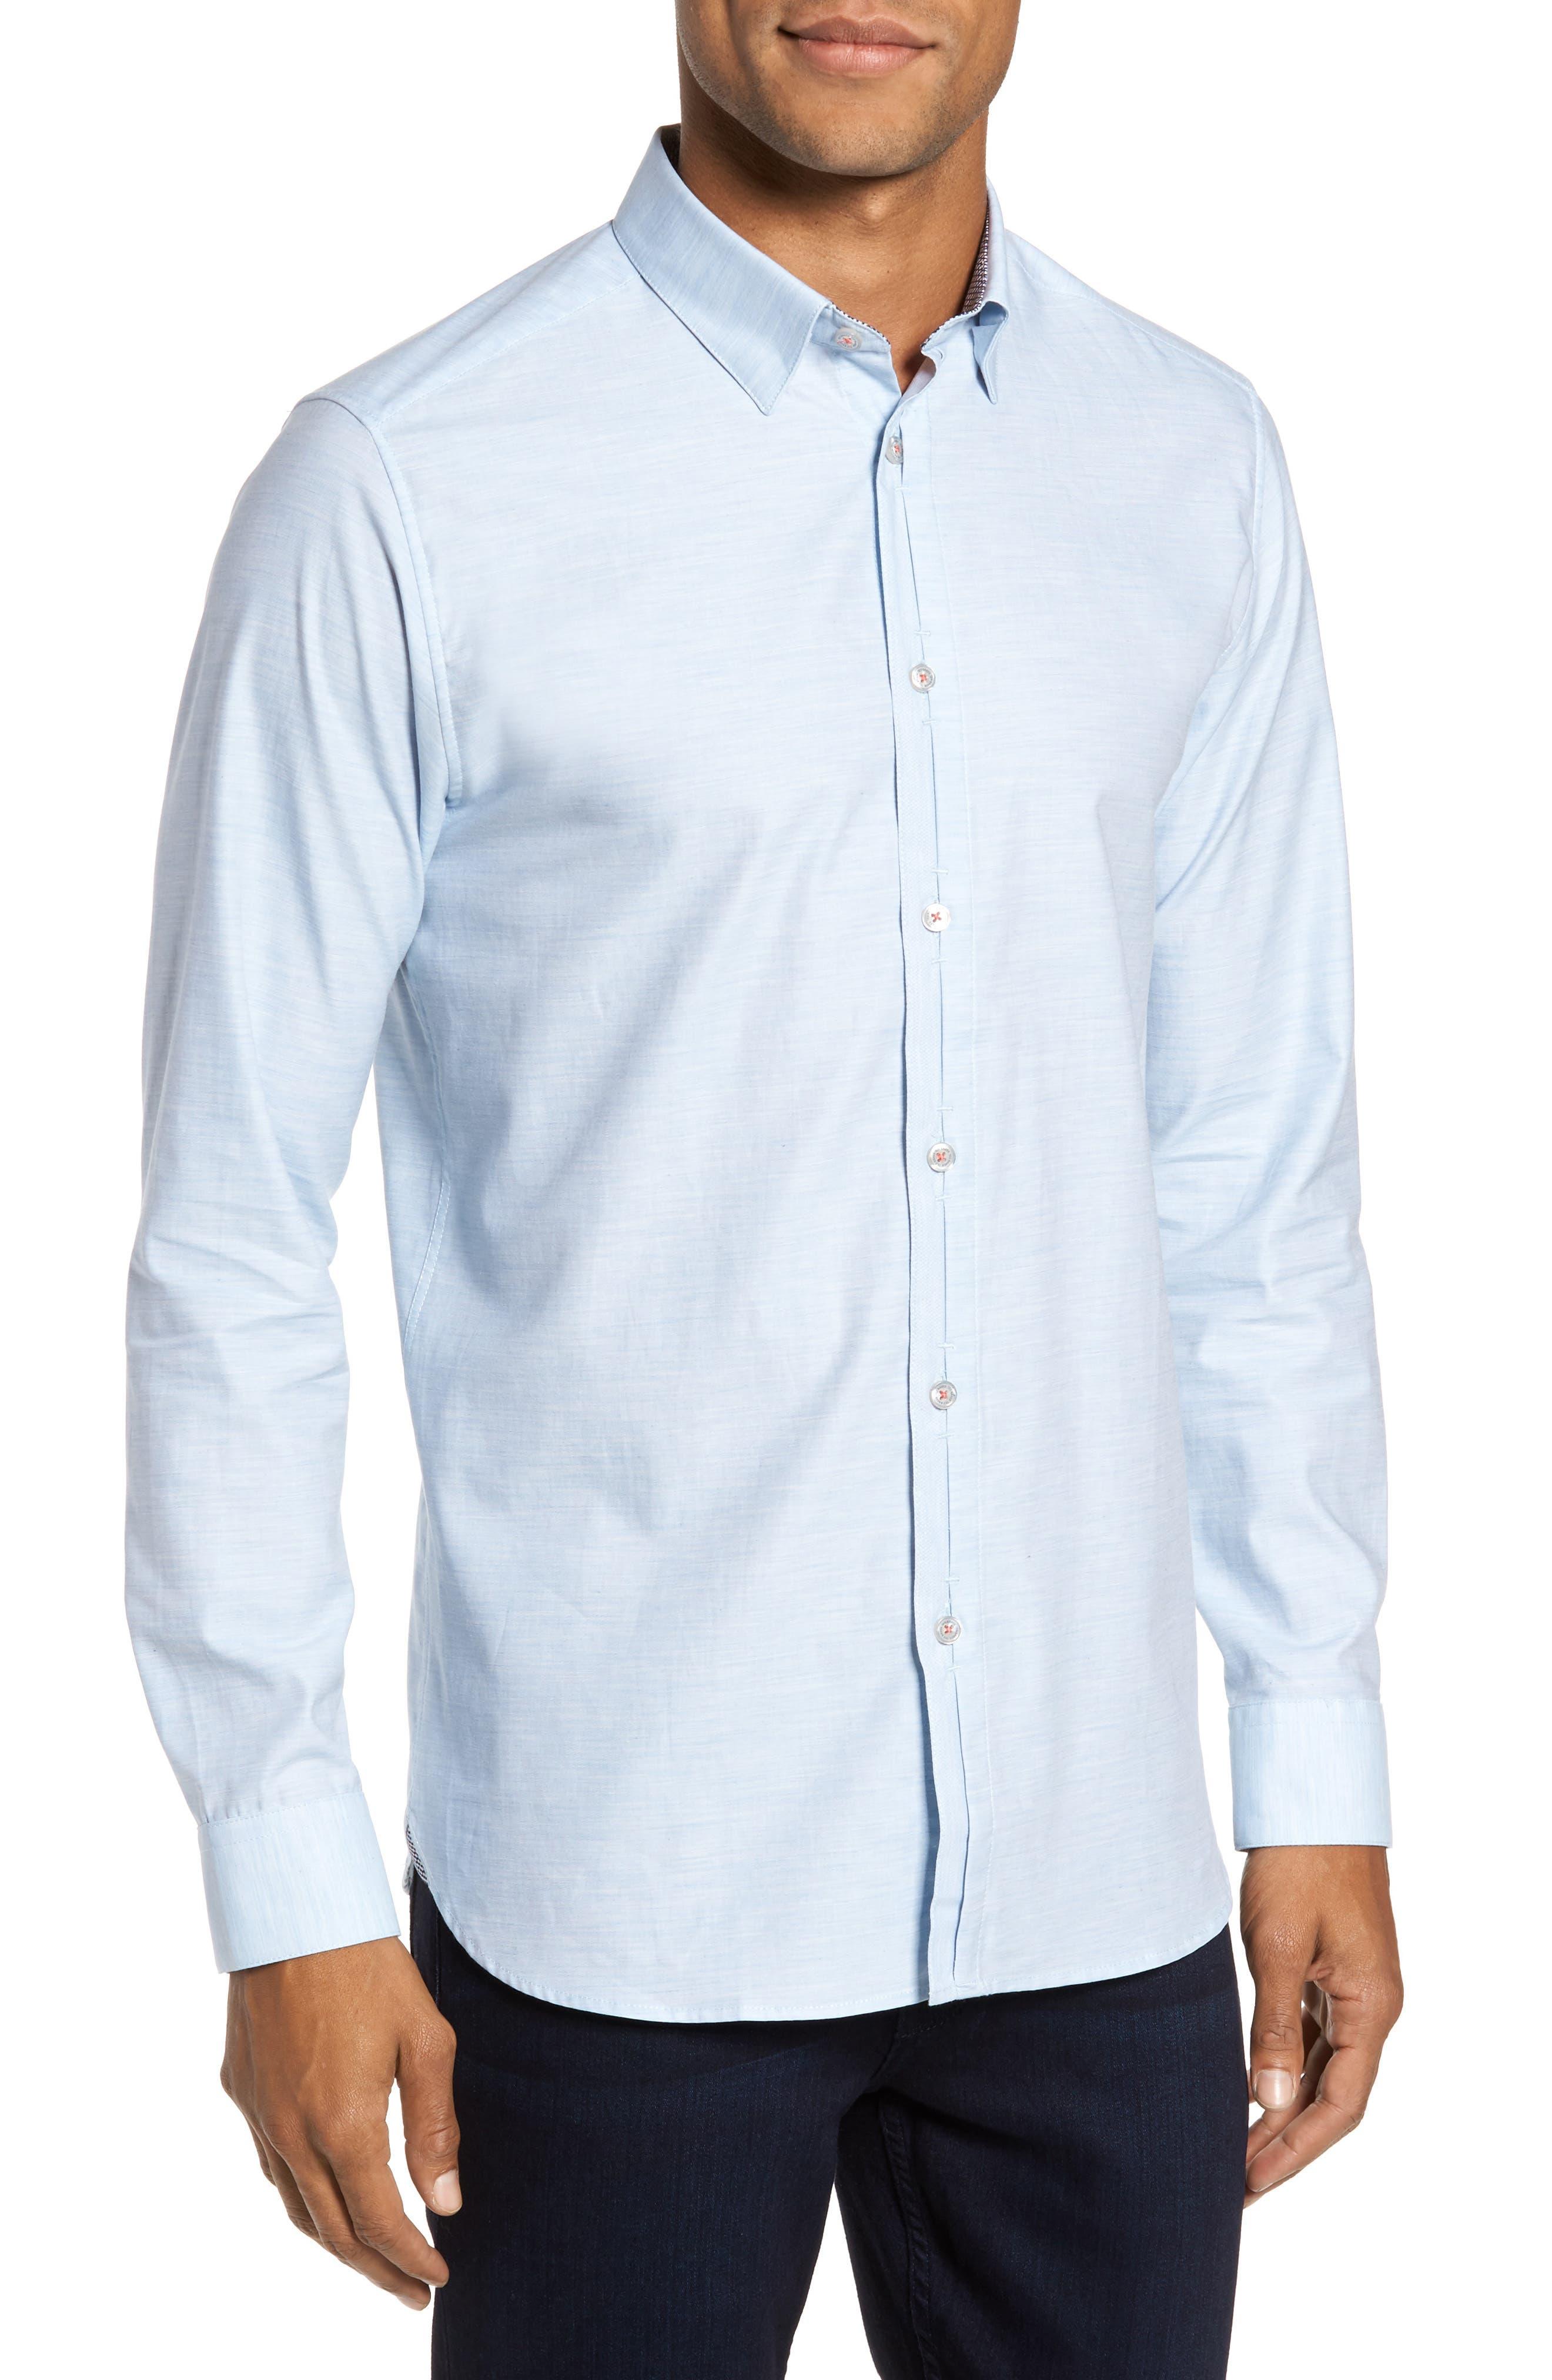 Alternate Image 1 Selected - Ted Baker London Annisley Modern Slim Fit Sport Shirt